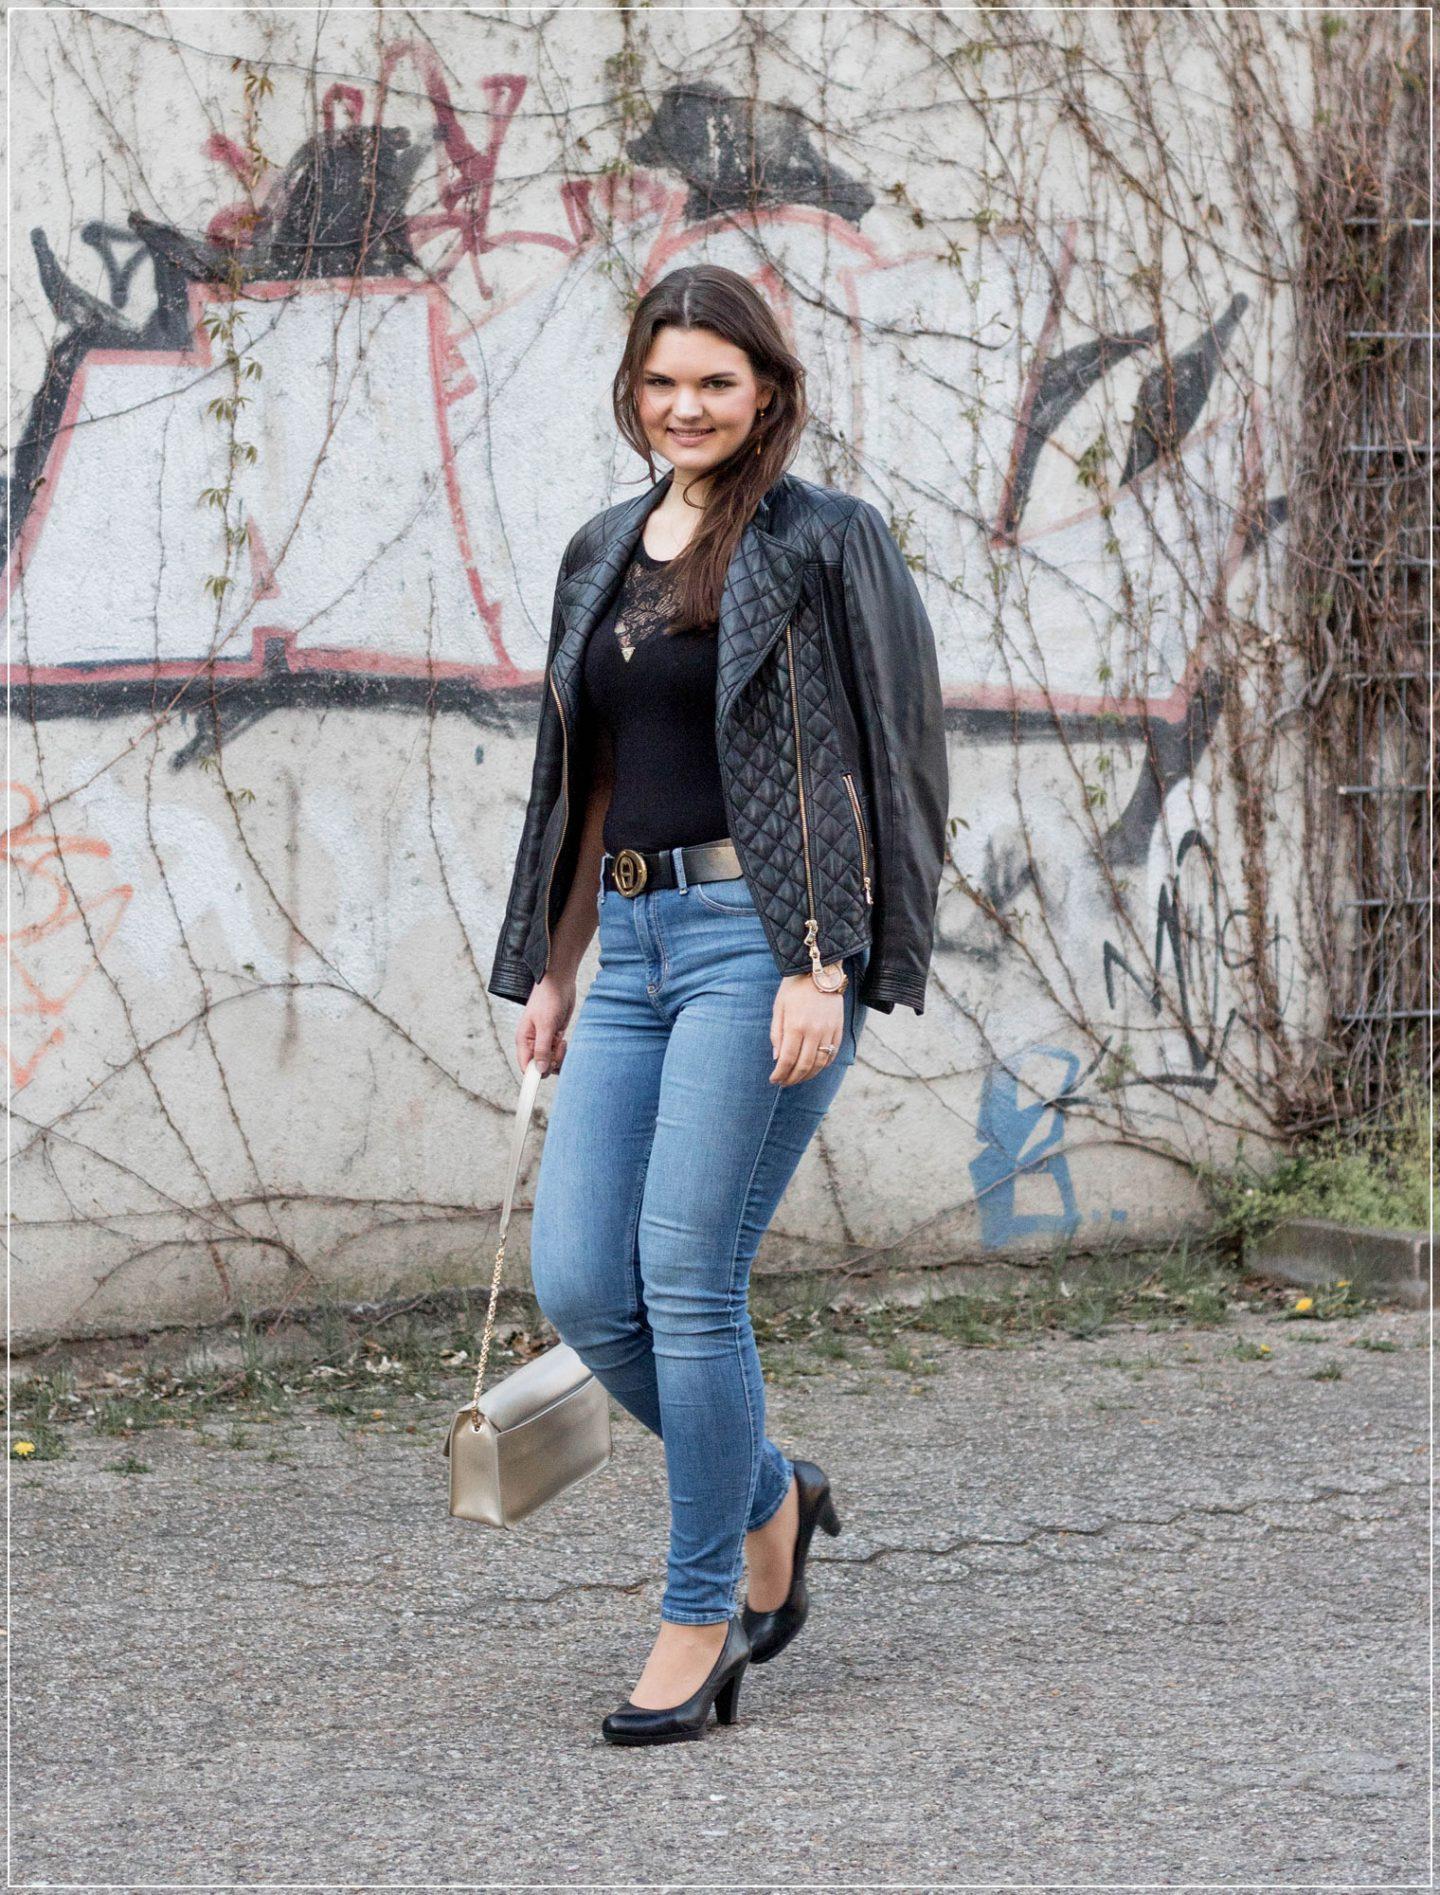 Modeklassiker, Abendoutfit, Denim-Style, eleganter Style, Styleguide, Outfitinspiration, Modebloggerin, Fashionbloggerin, Modeblog, Ruhrgebiet